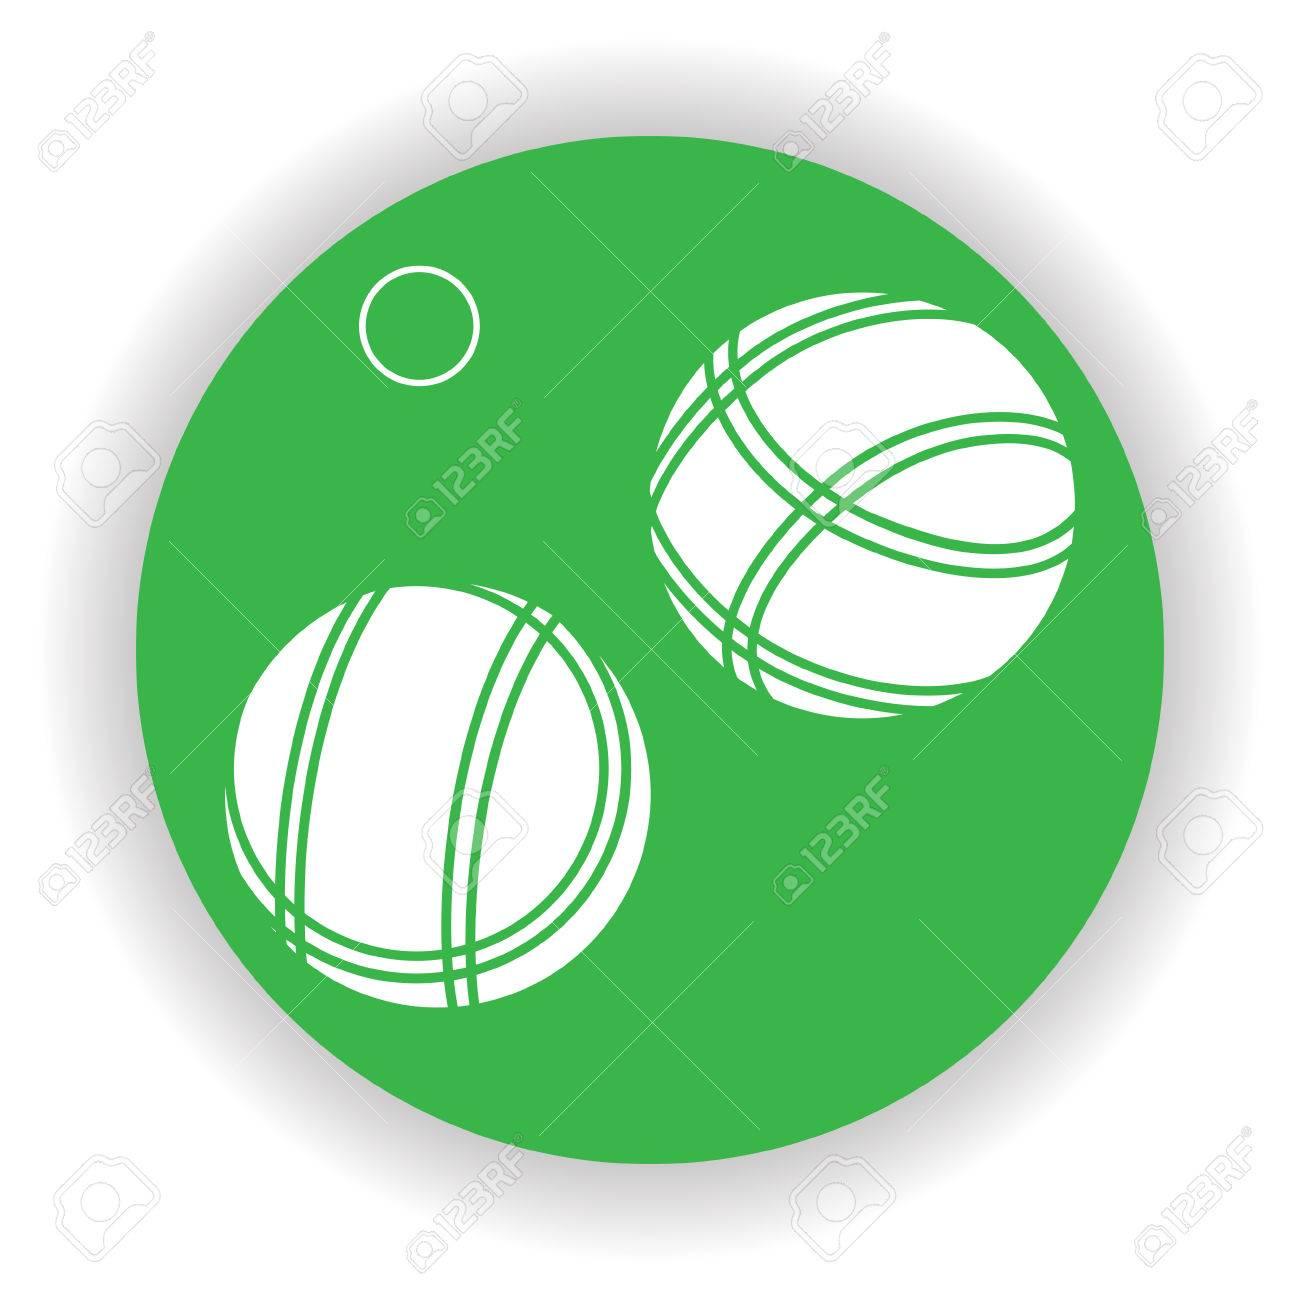 bocce balls icon vector royalty free cliparts vectors and stock rh 123rf com Bocce Ball Drawings Bocce Ball Graphics